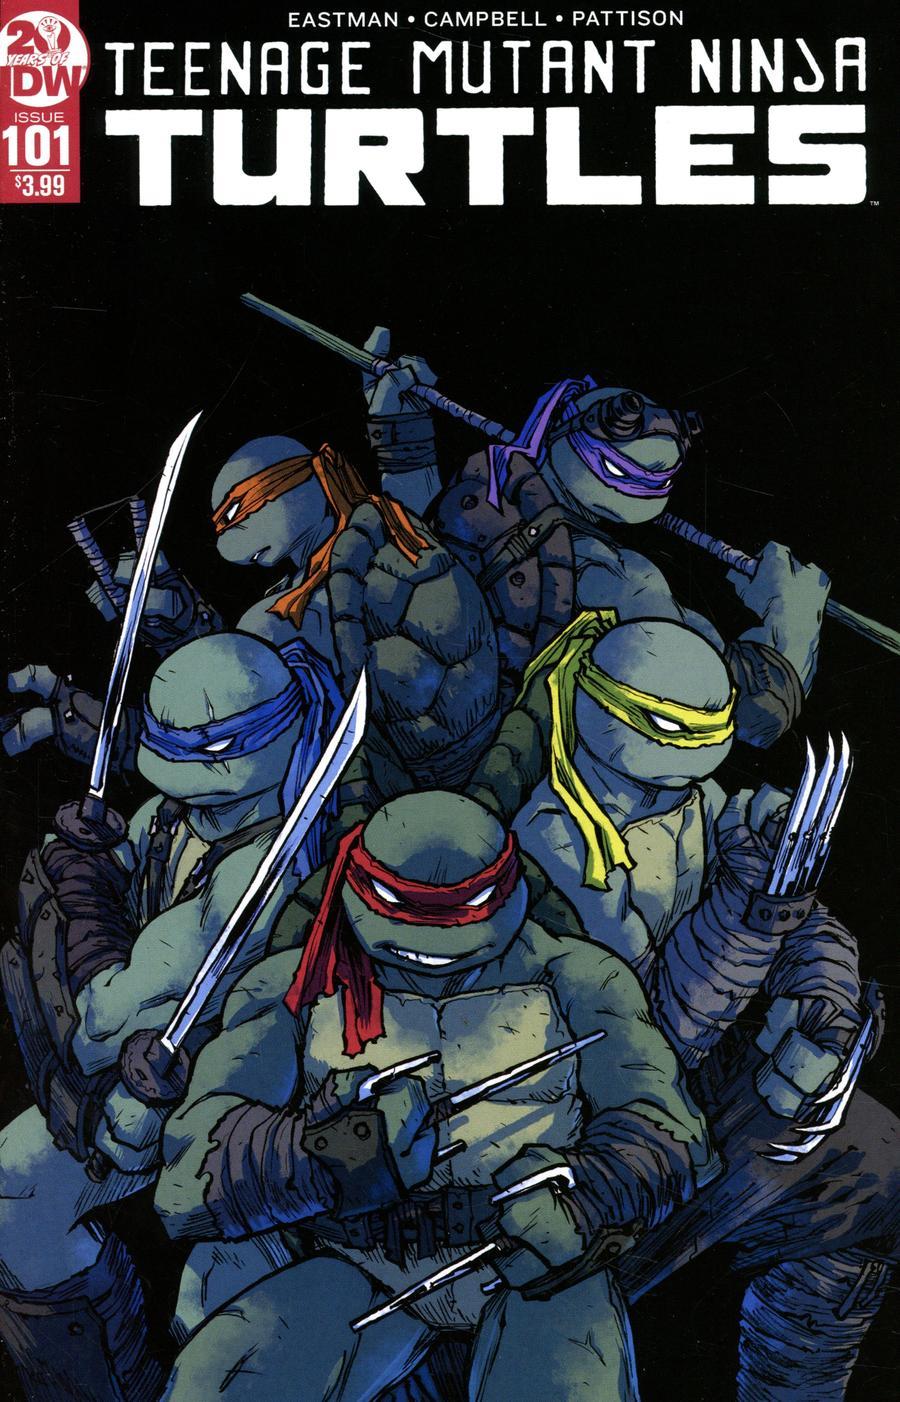 Teenage Mutant Ninja Turtles Vol 5 #101 Cover D 2nd Ptg Variant Sophie Campbell Cover